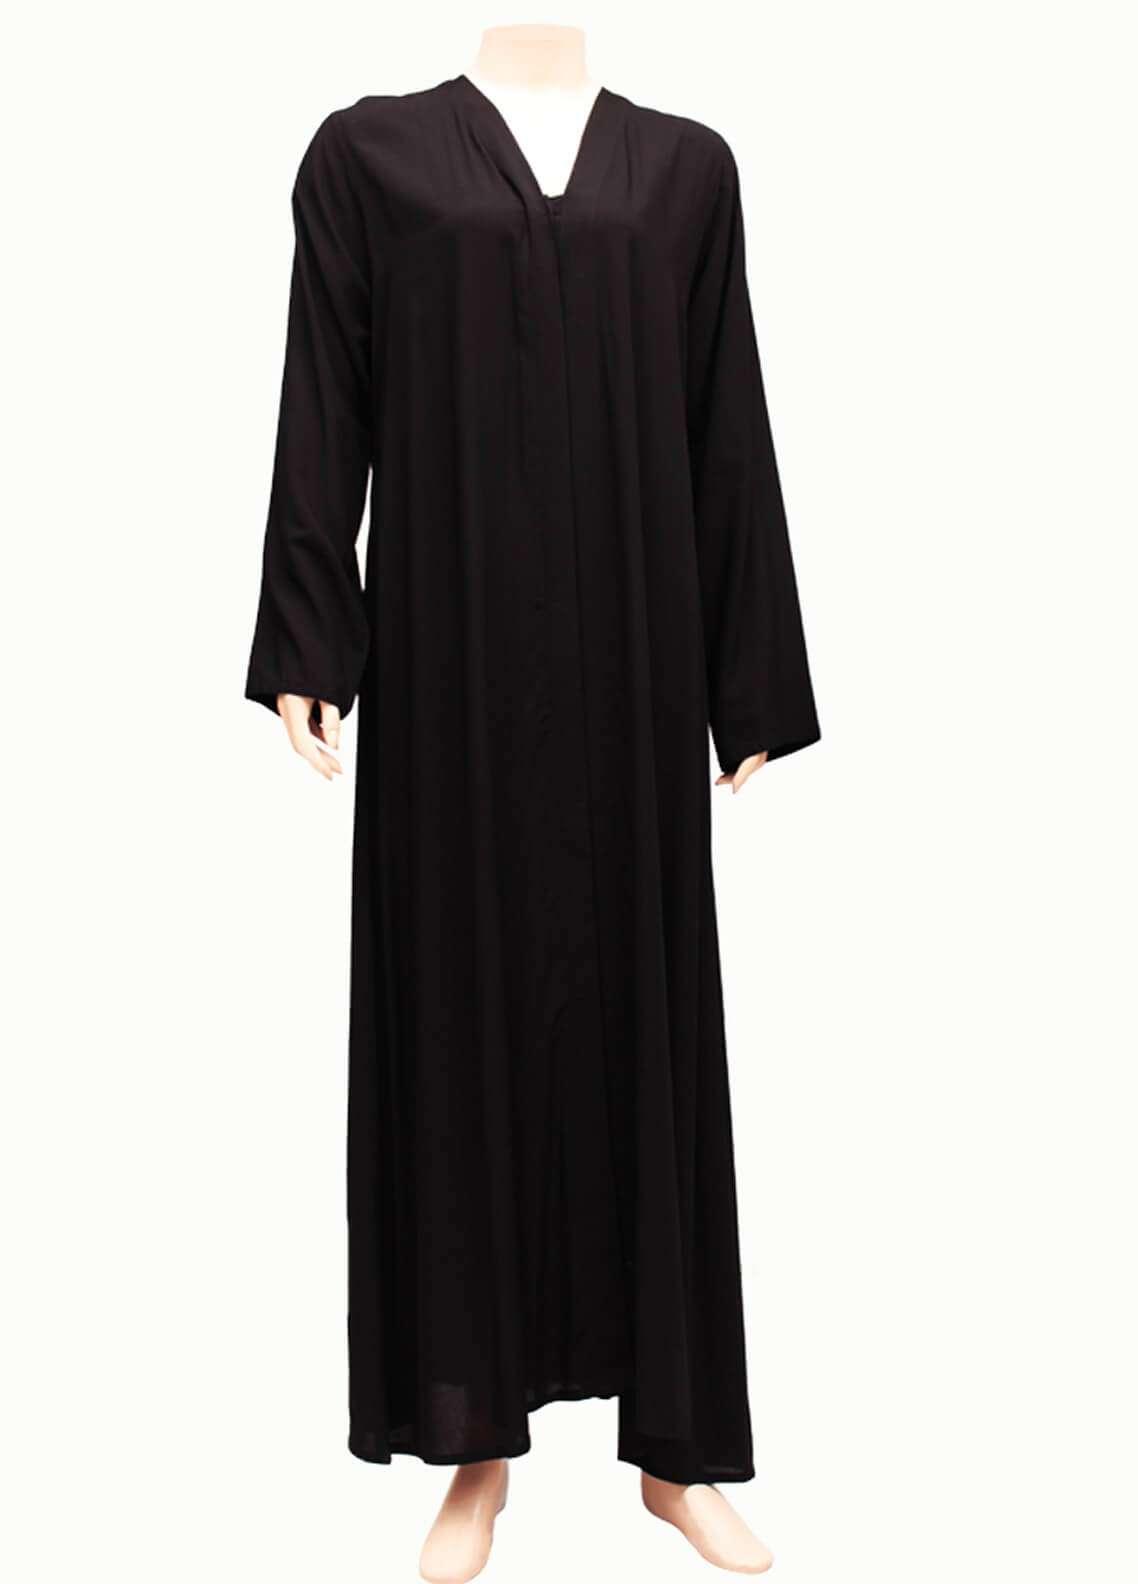 Hijab ul Hareem  Abayas New Stylish Designered Lawn Abaya 0116-P Black